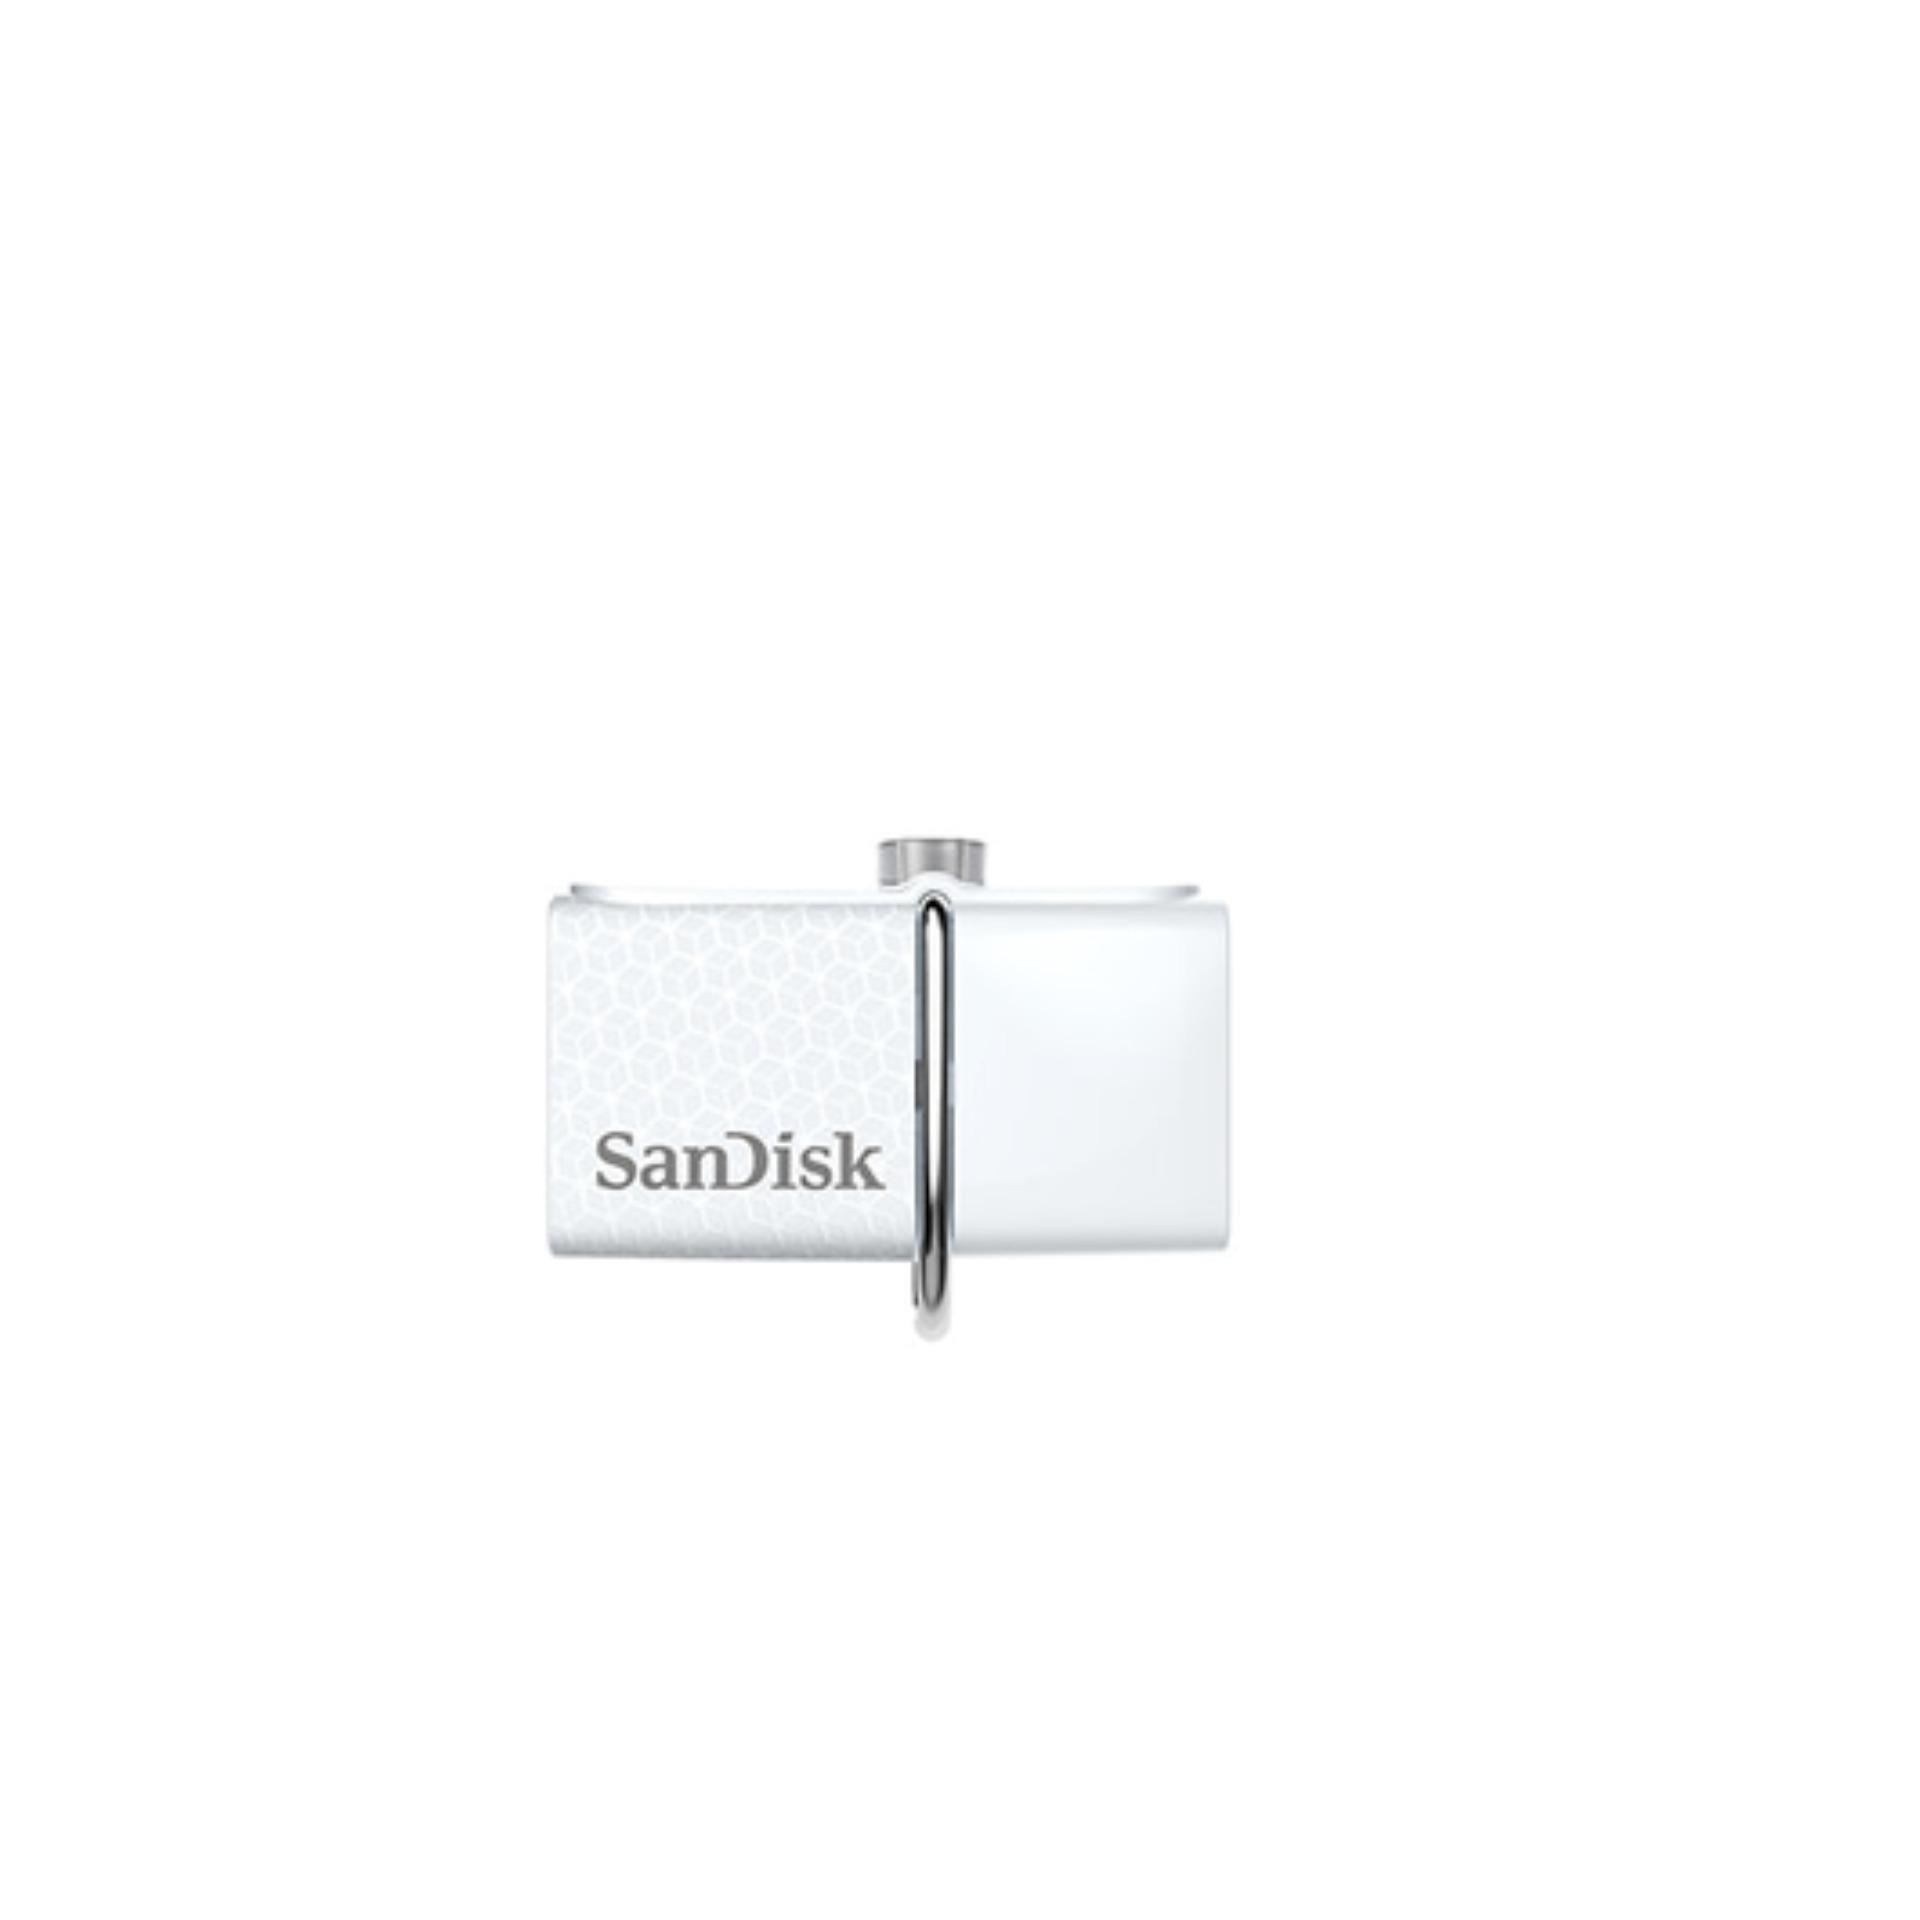 Harga Penawaran Sandisk Ultra Dual Usb Drive 30 32gb Flashdisk Flasdisk Otg 16gb White